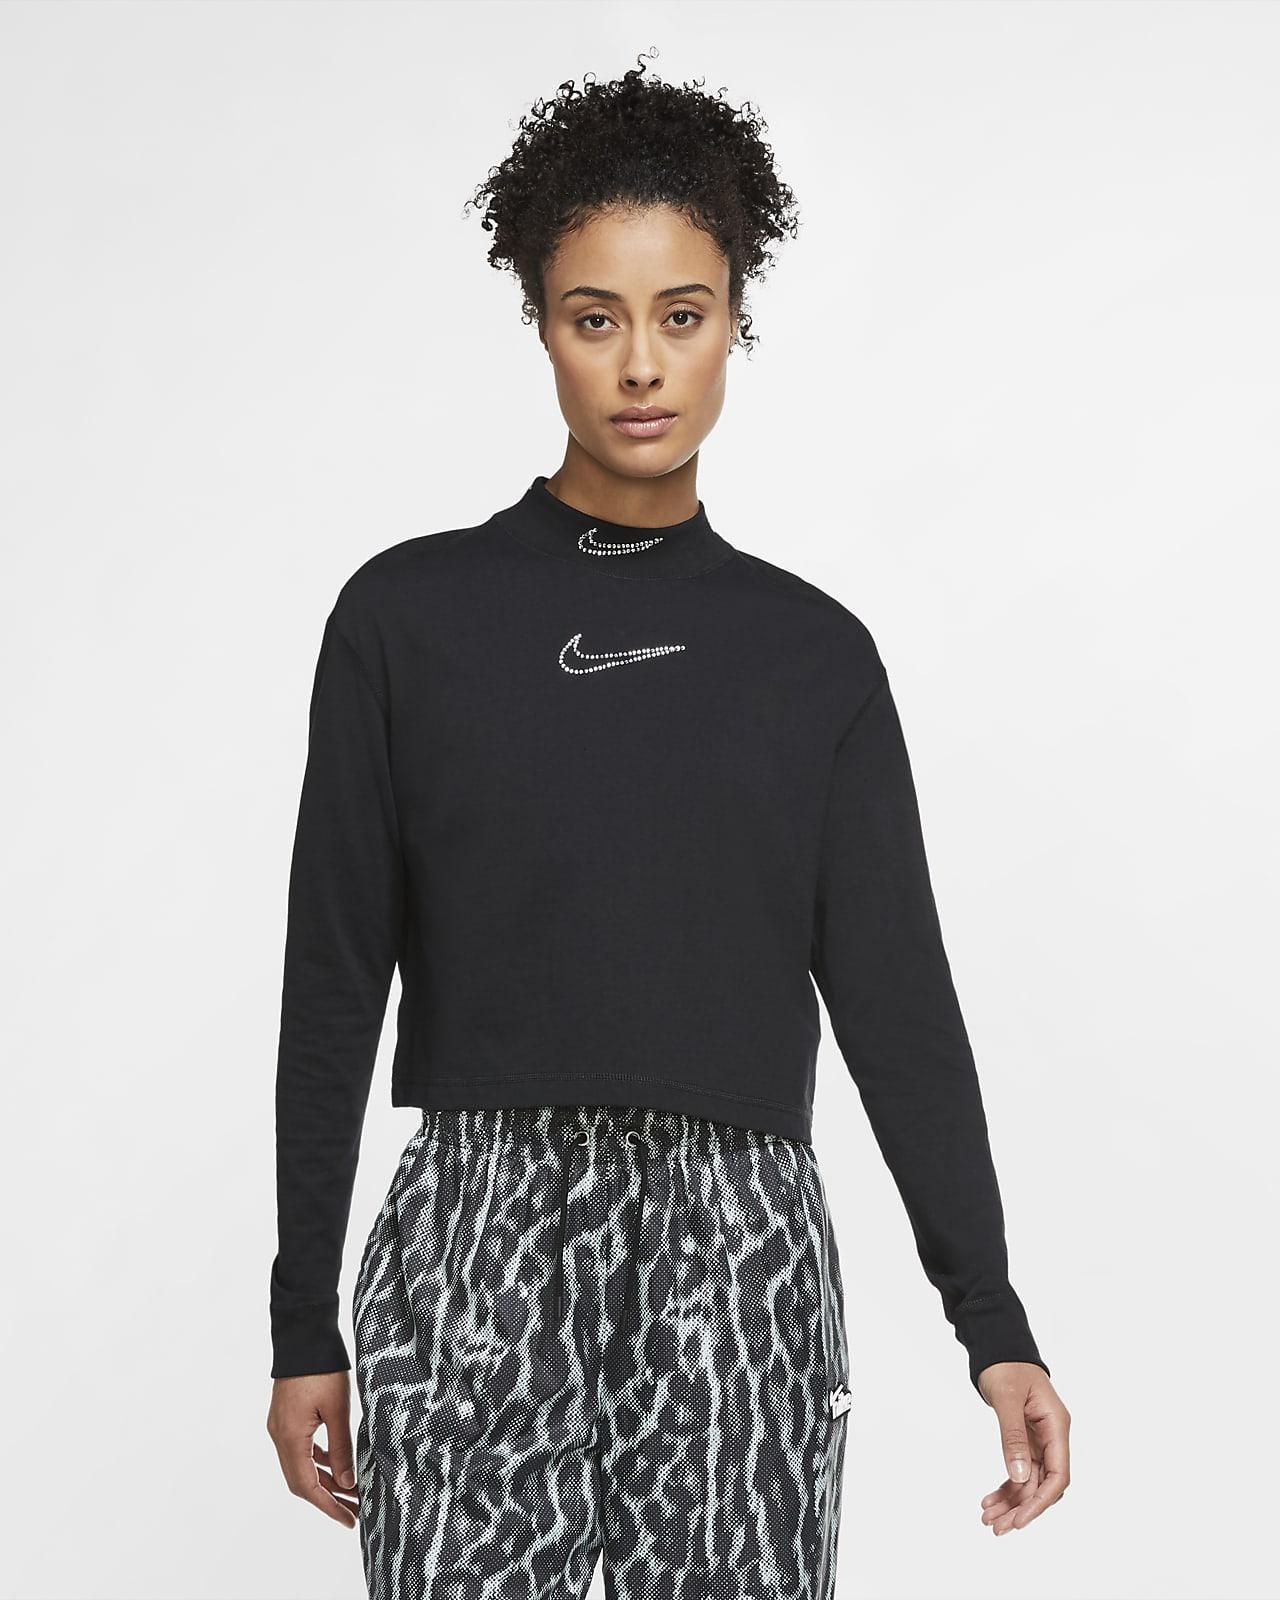 Женская укороченная футболка с длинным рукавом Nike Sportswear Rhinestone